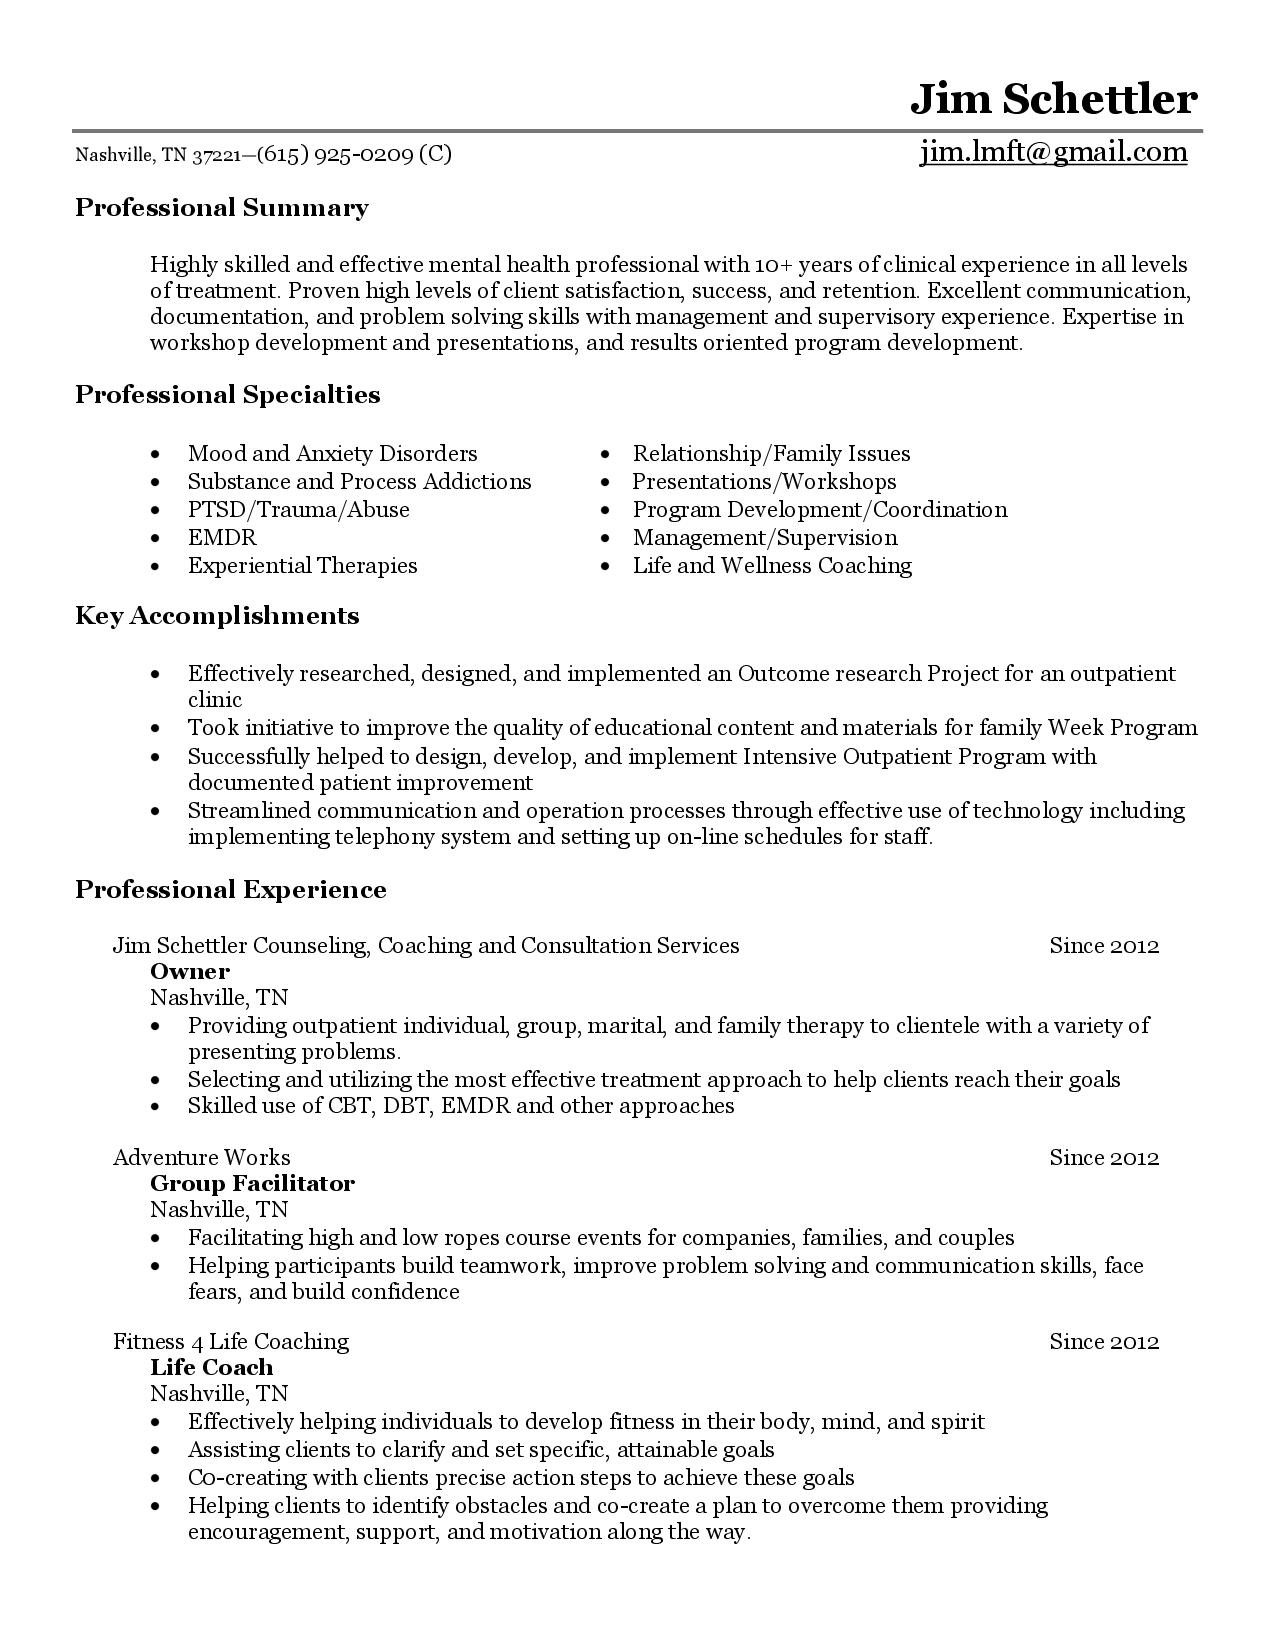 Behavioral Health Counselor Resume Sample